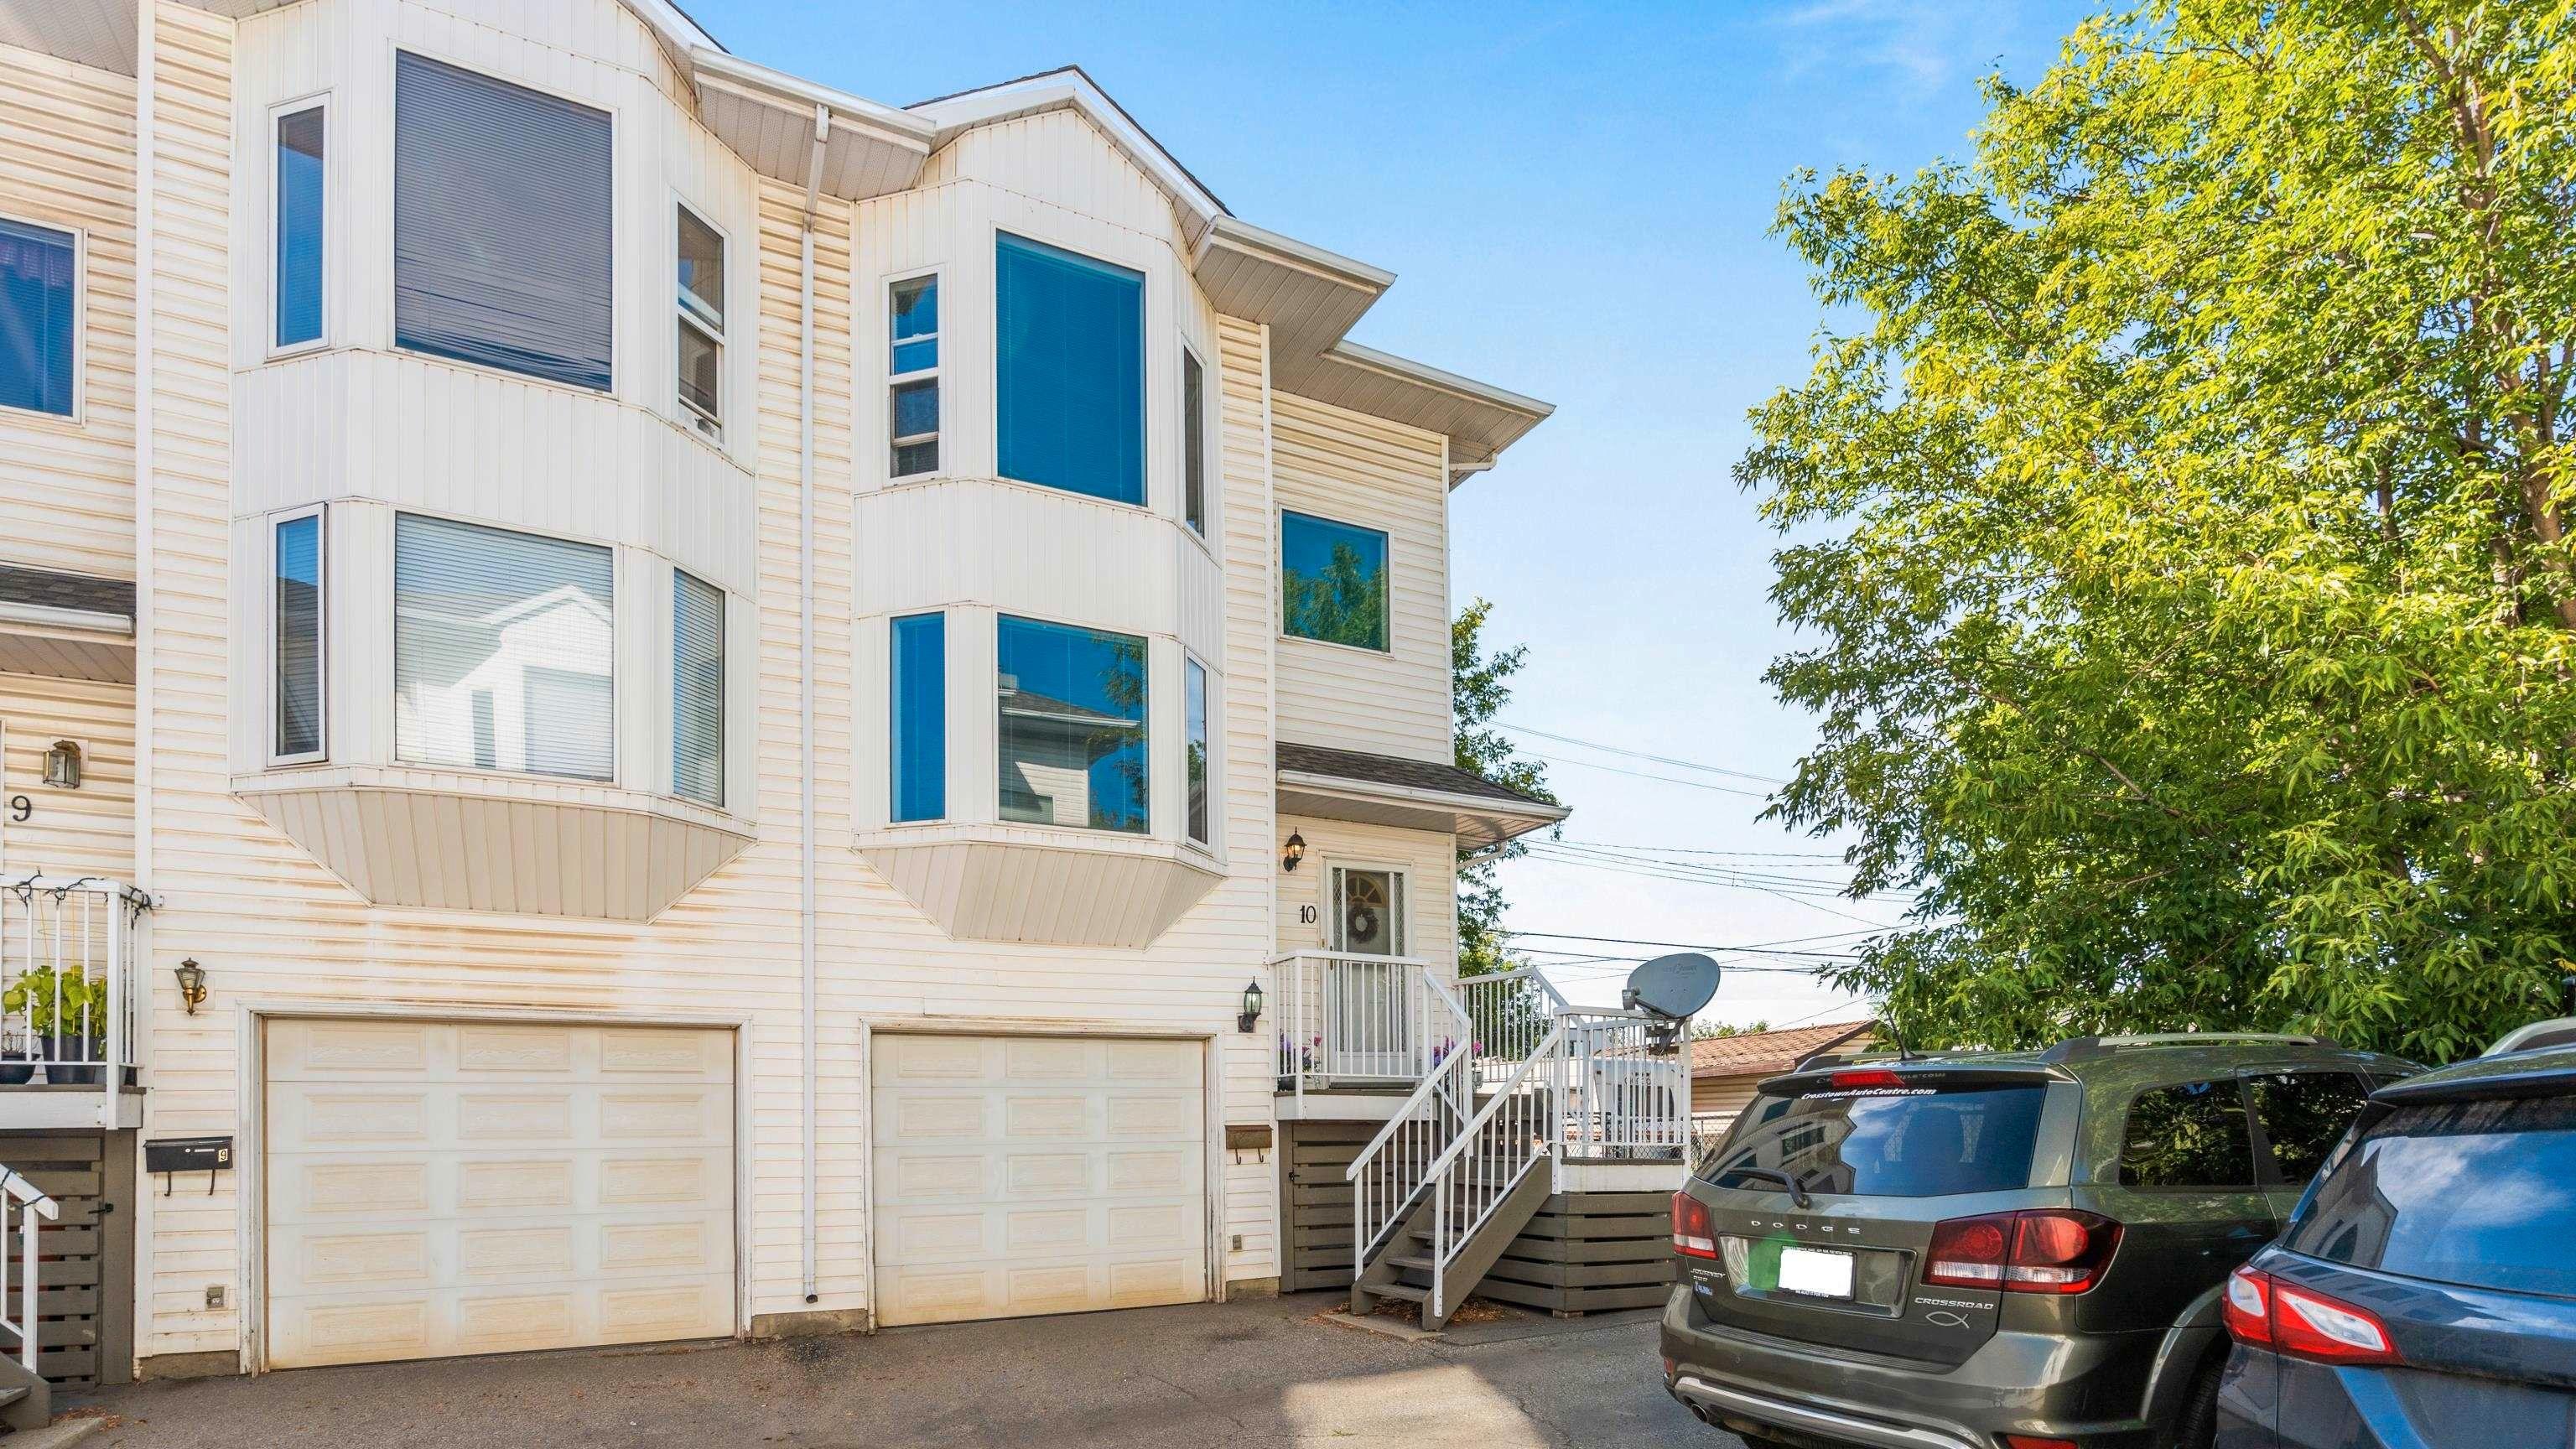 Main Photo: 10 11718 97 Street in Edmonton: Zone 08 House Half Duplex for sale : MLS®# E4258392